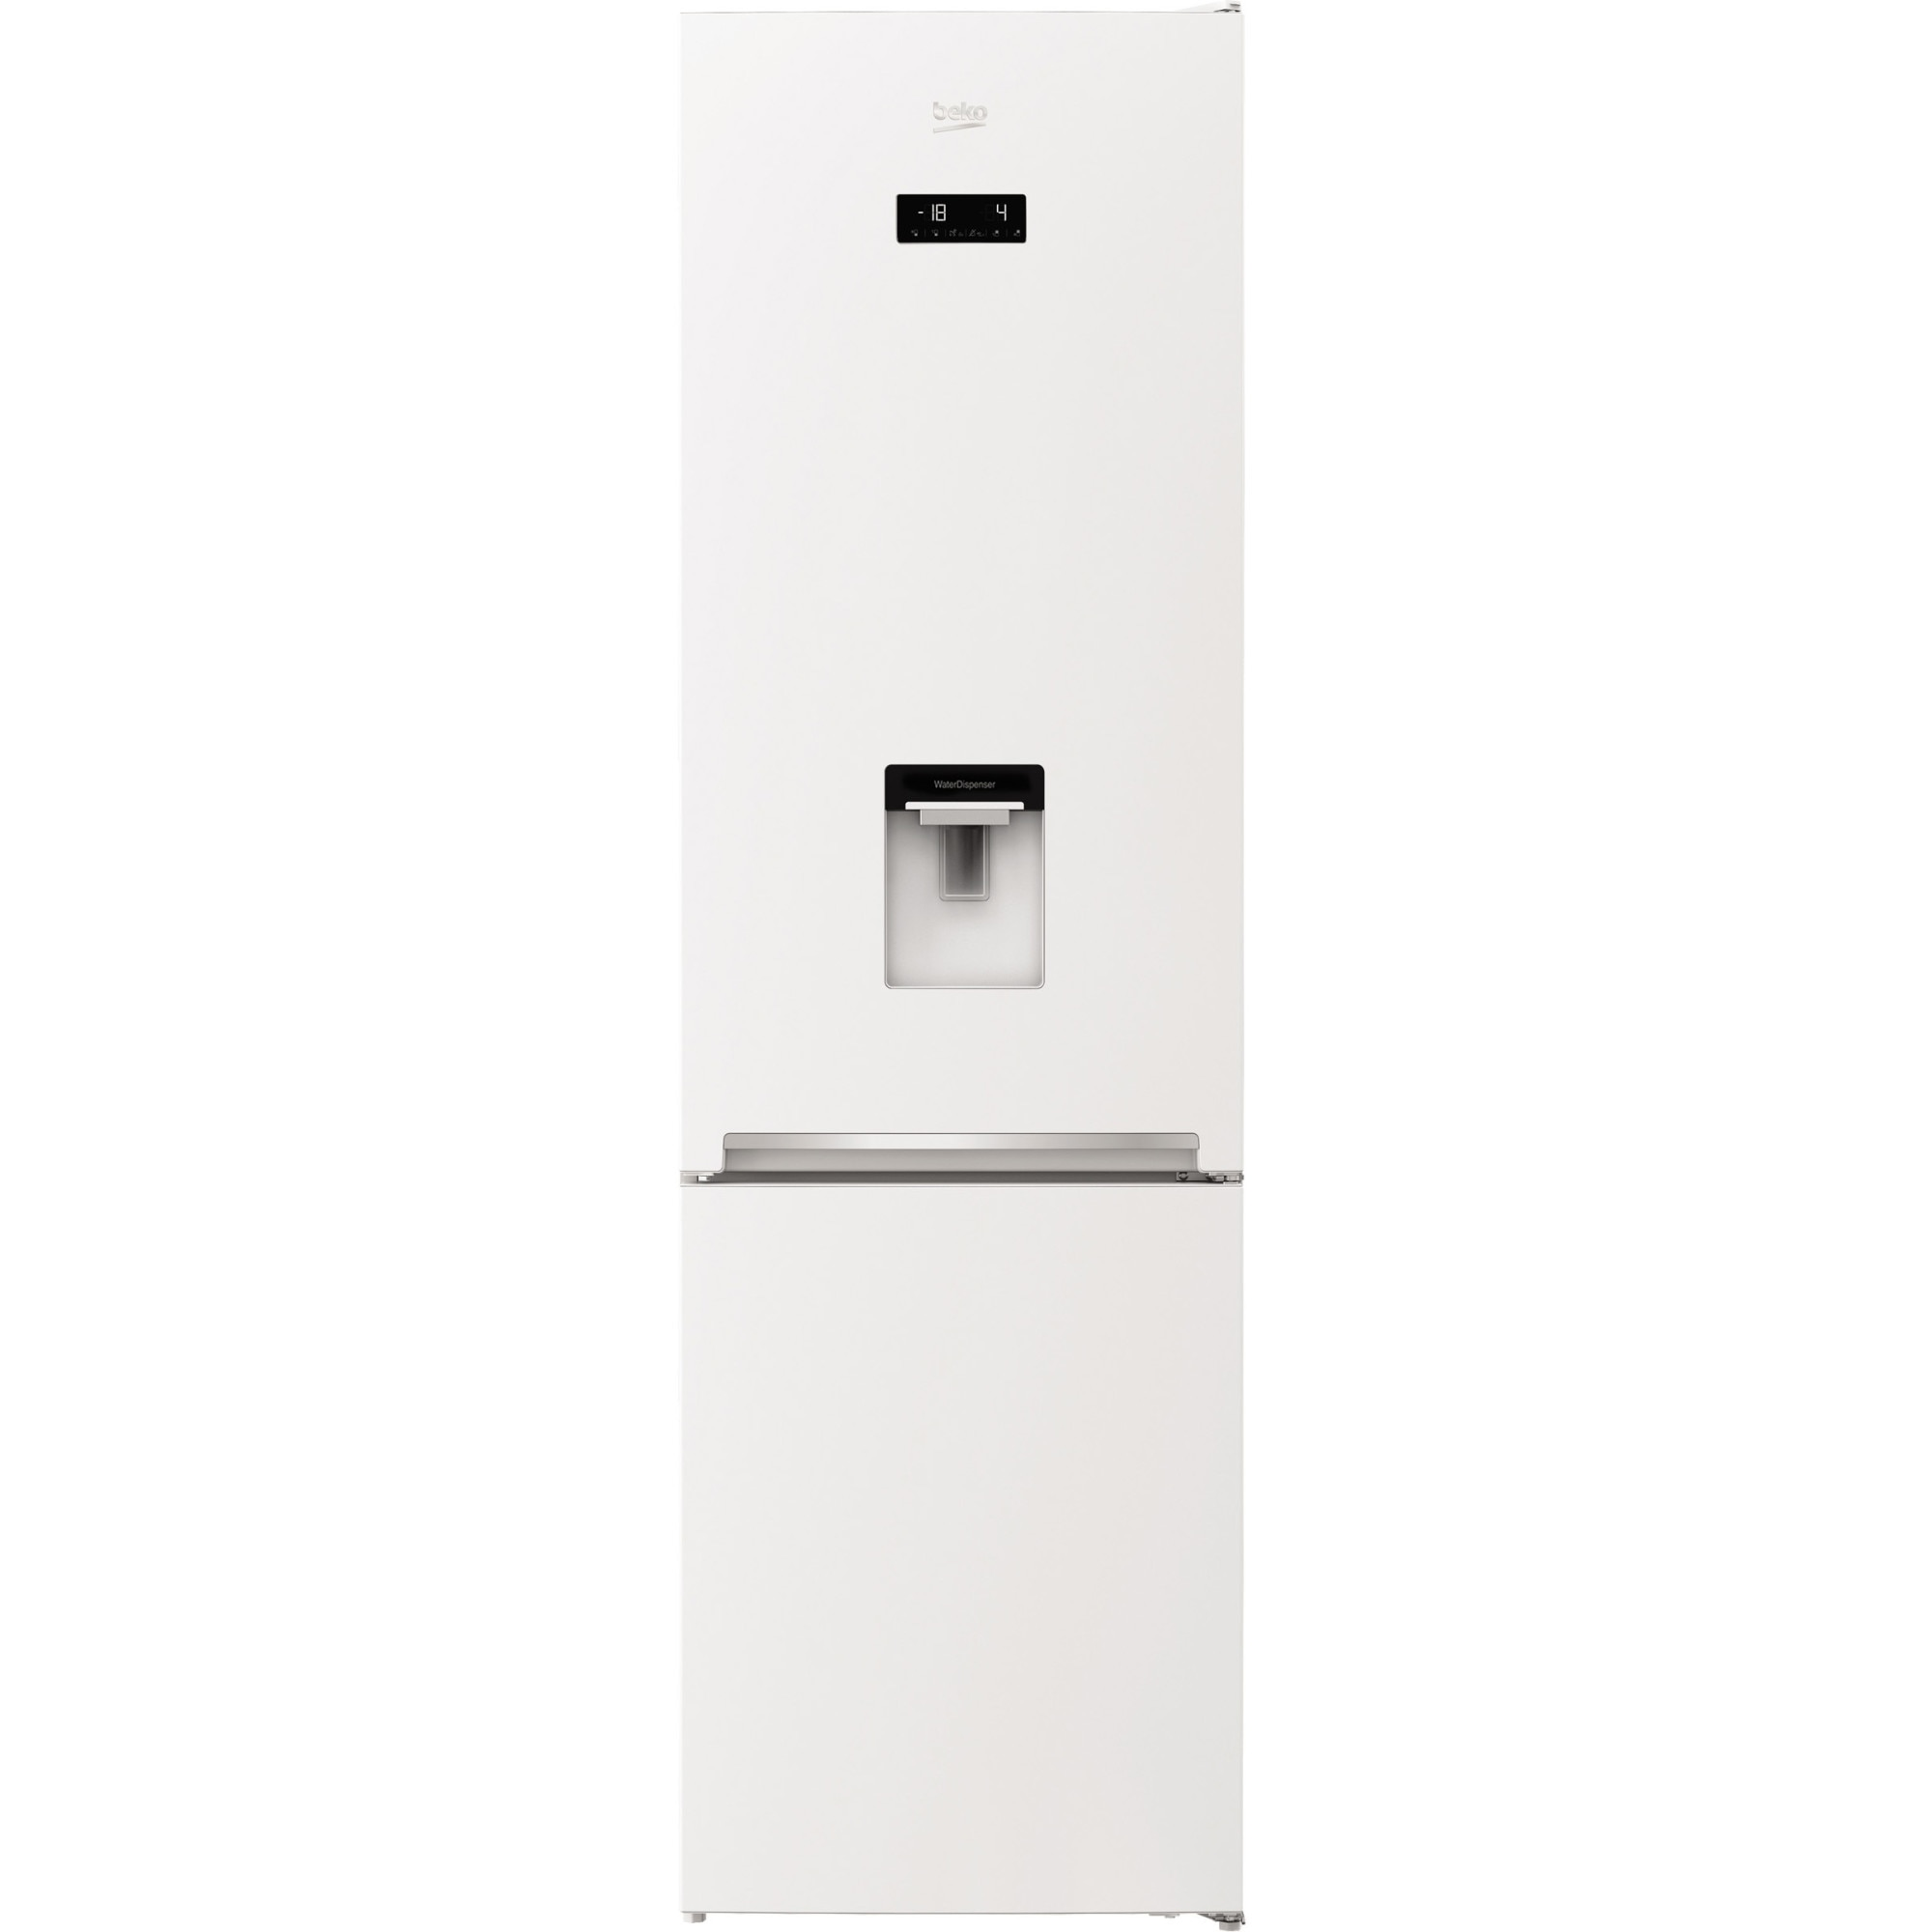 Fotografie Combina frigorifica Beko RCNA406E40DZWN, 362 l, NeoFrost Dual Cooling, Display touch control, Raft sticle, Clasa E, H 203 cm, Alb